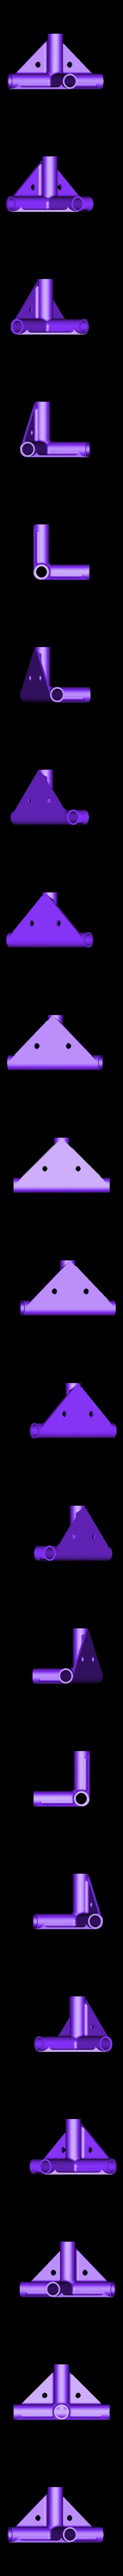 raccord droit 4 tubes 90 simple glissant.stl Download free STL file Pipe brackets dia 12 • 3D printing model, mk25